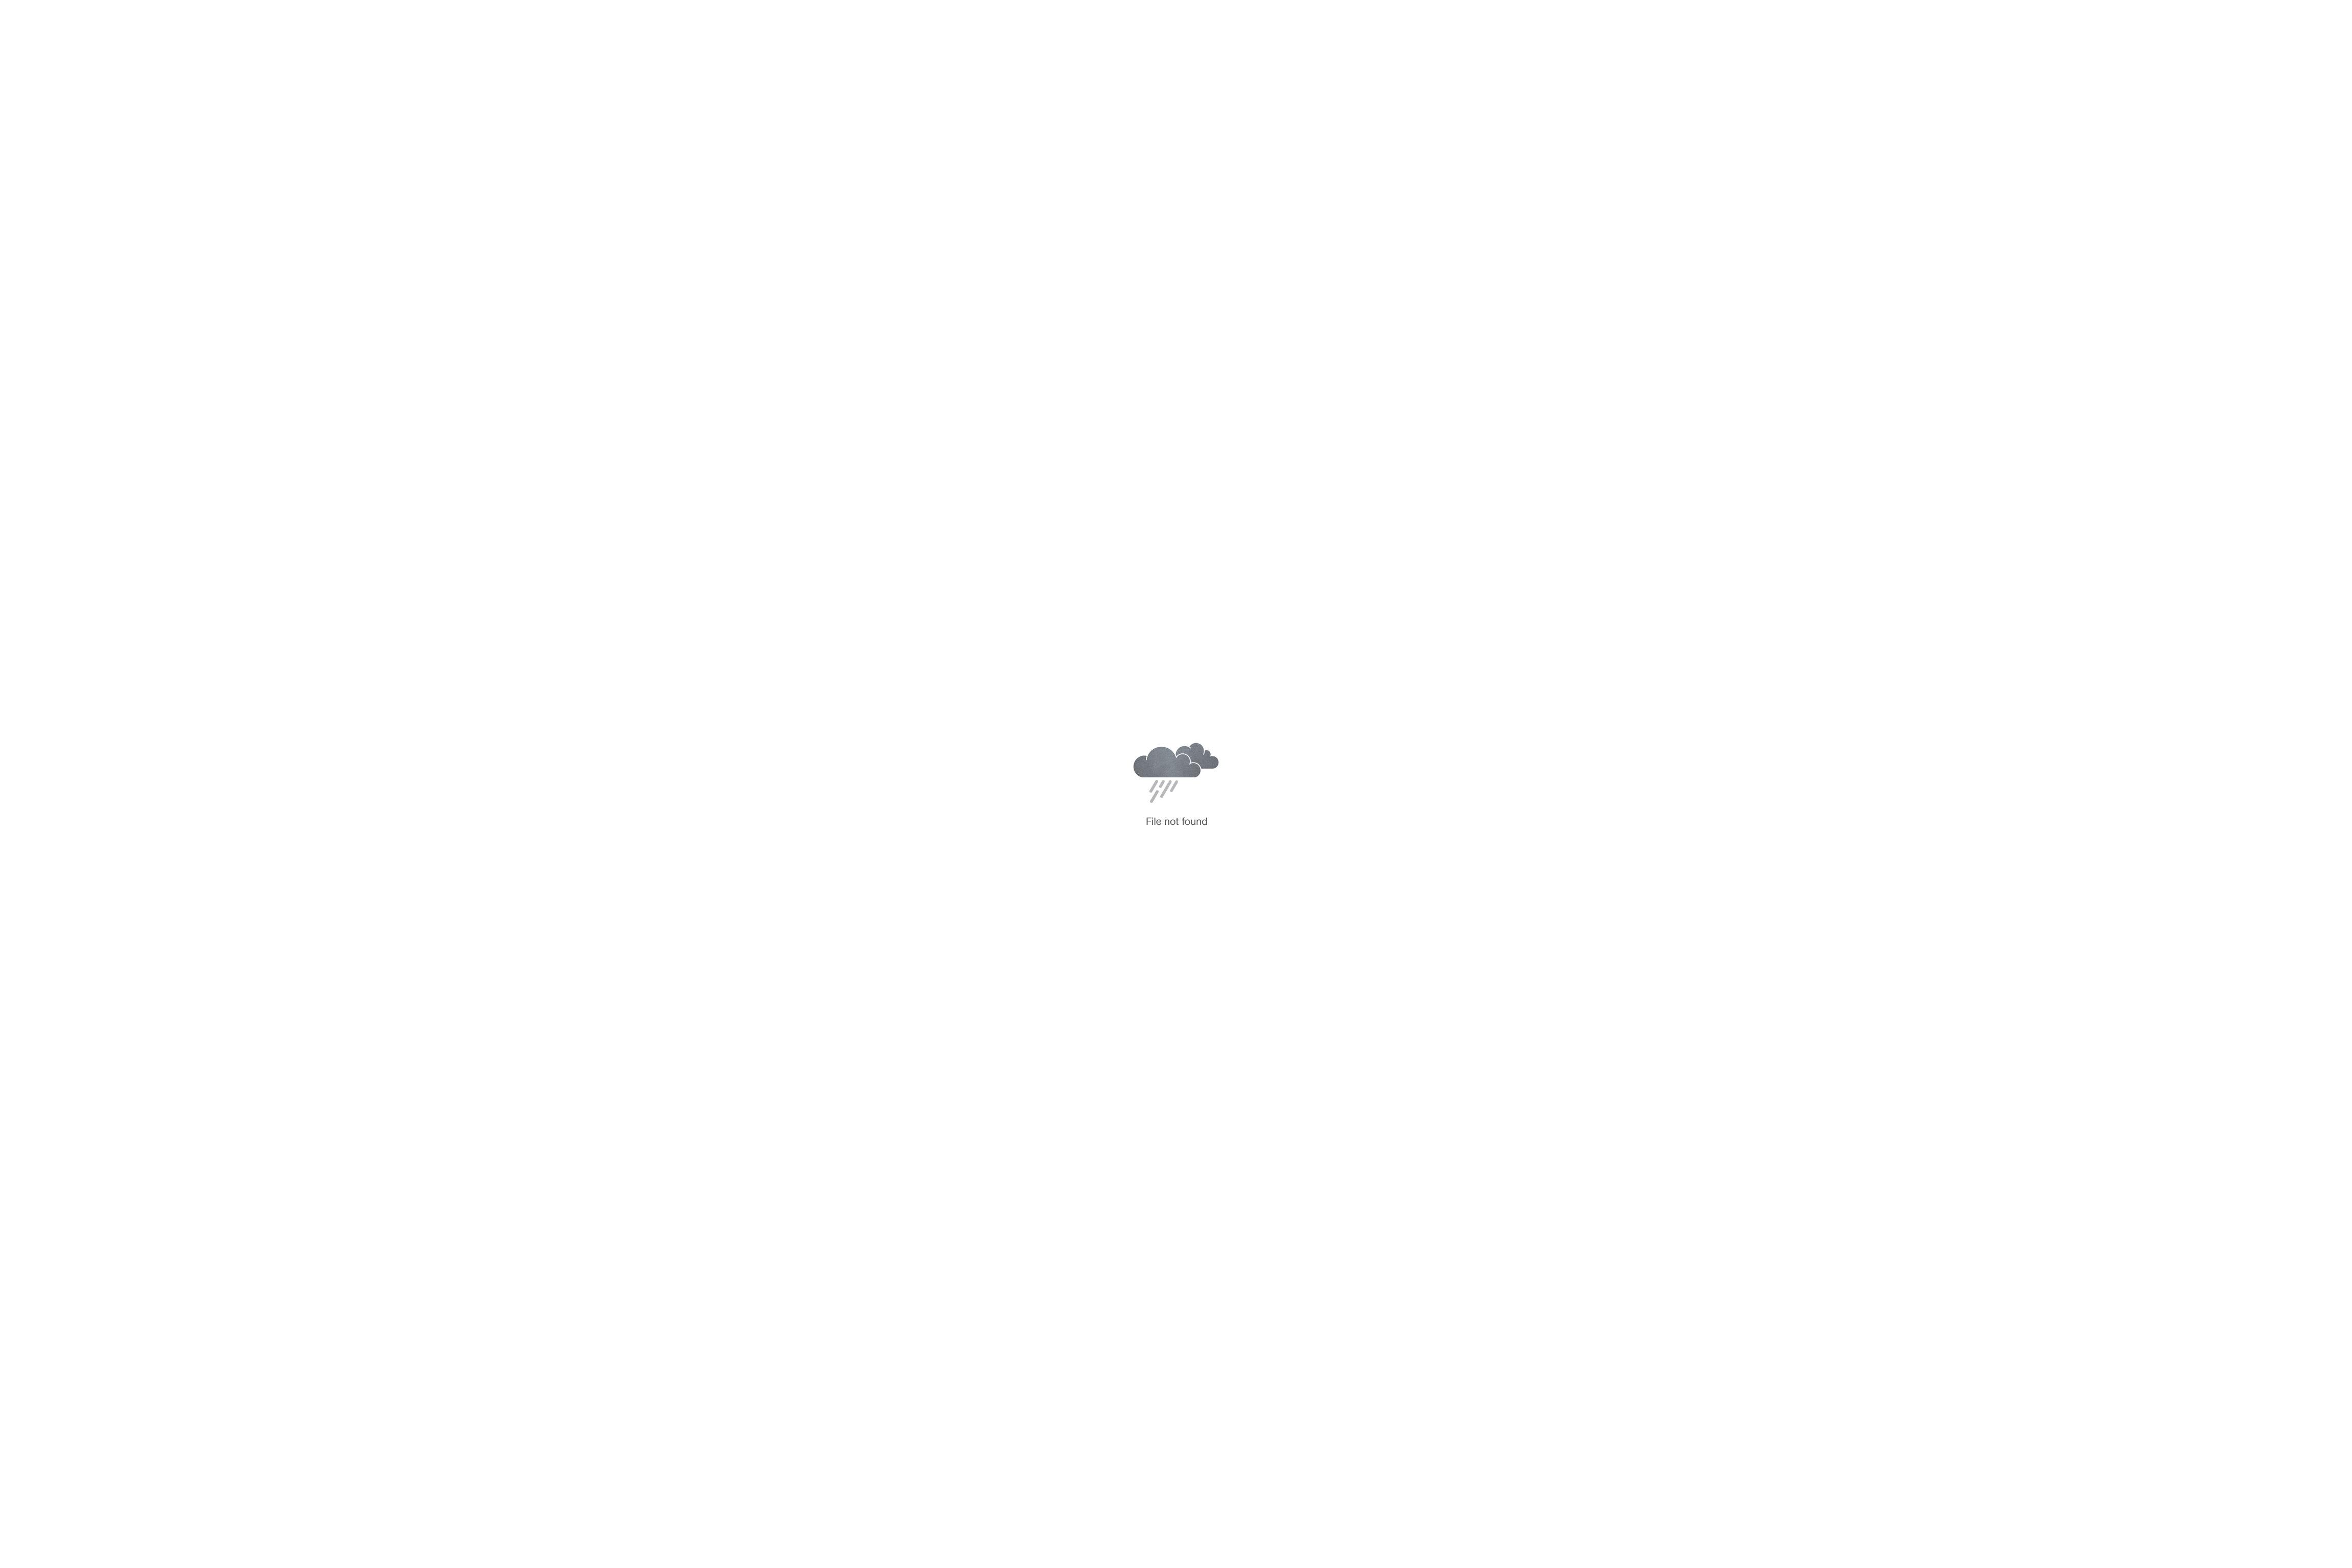 Association sportive-Lycée Romain Rolland Goussainville-Rugby-Sponsorise-me-image-1